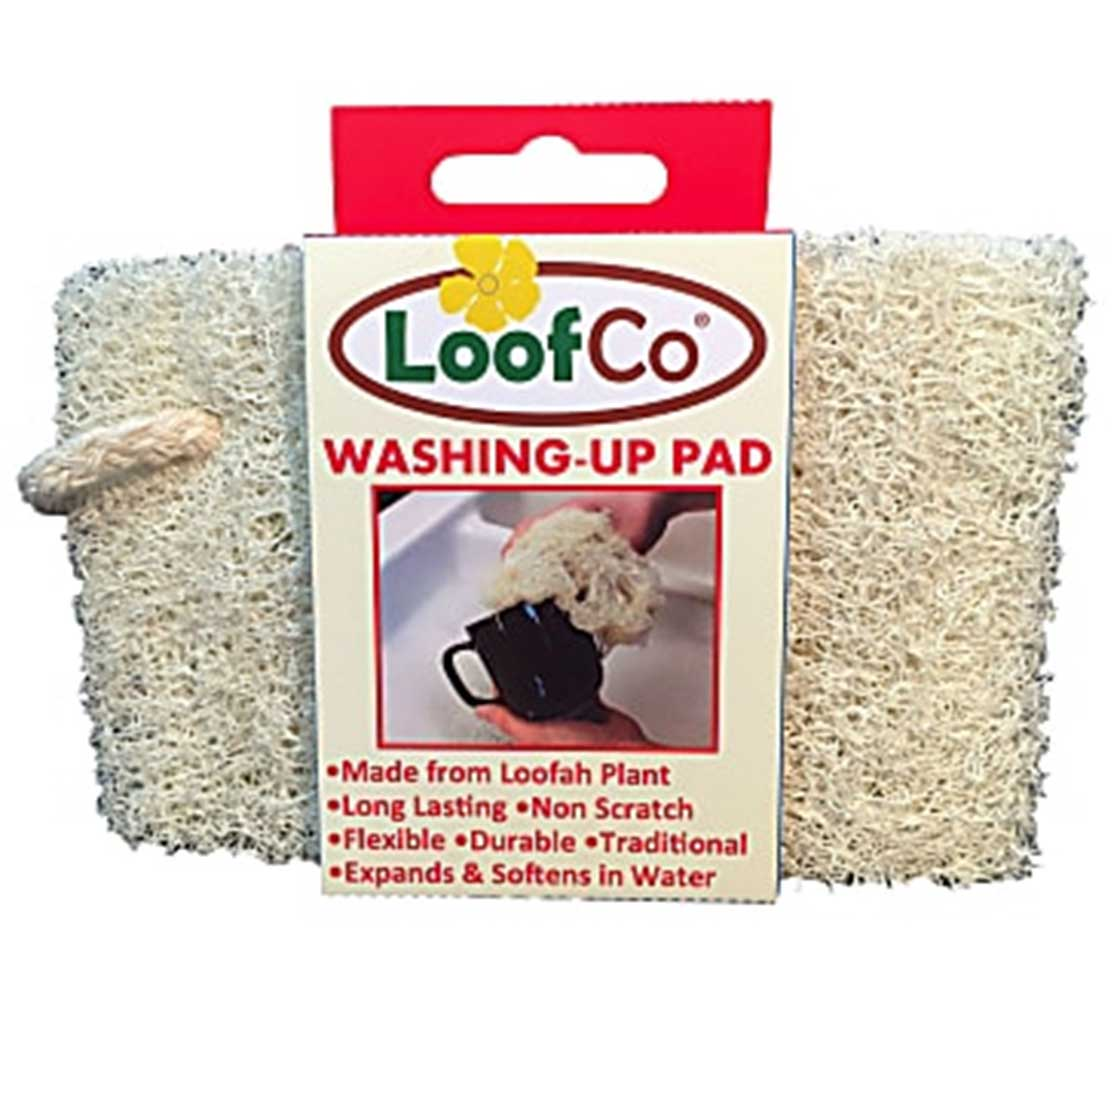 Washing-up Pad, Loofah Plant (Loofco)